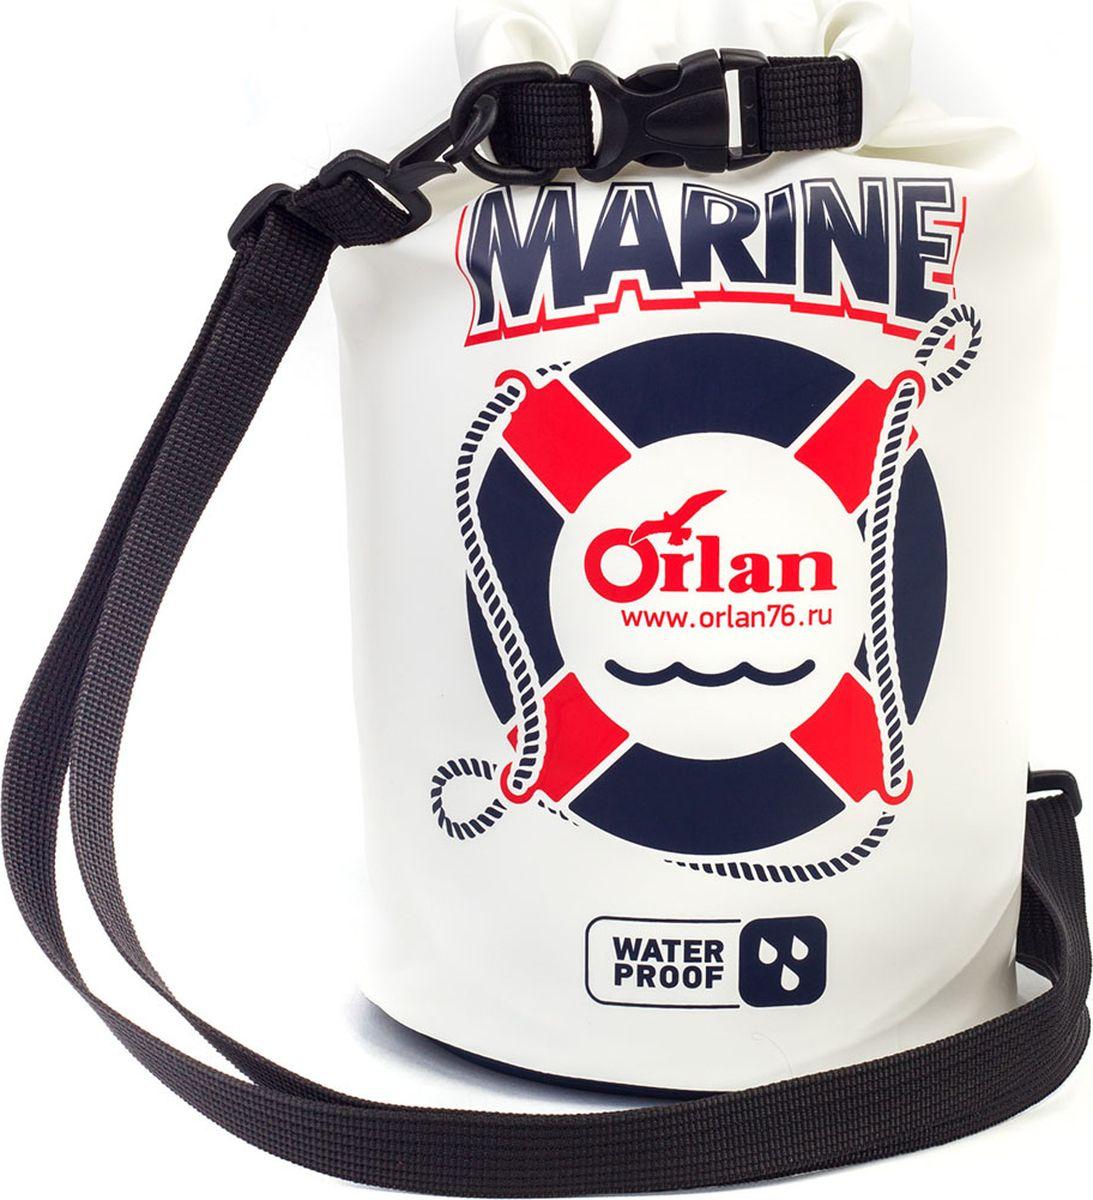 Гермомешок Orlan Marina, цвет: белый, 5 л